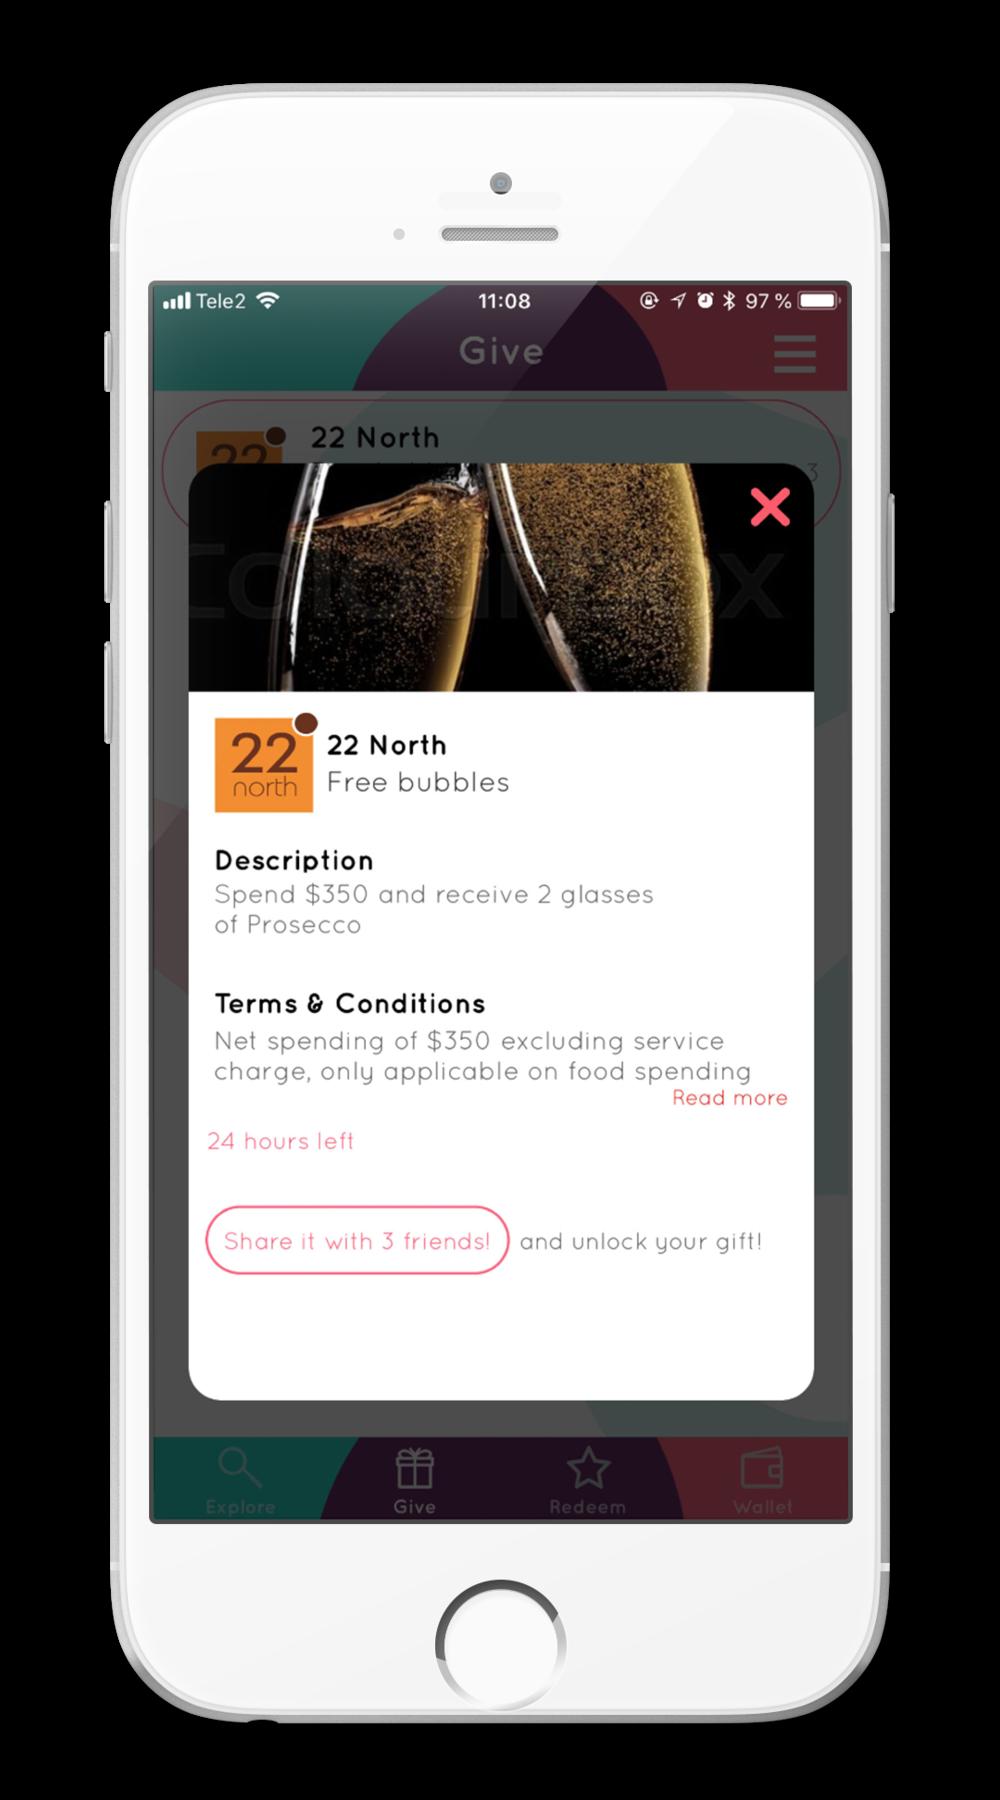 iPhone6 App Mockup Gift Redeem.png